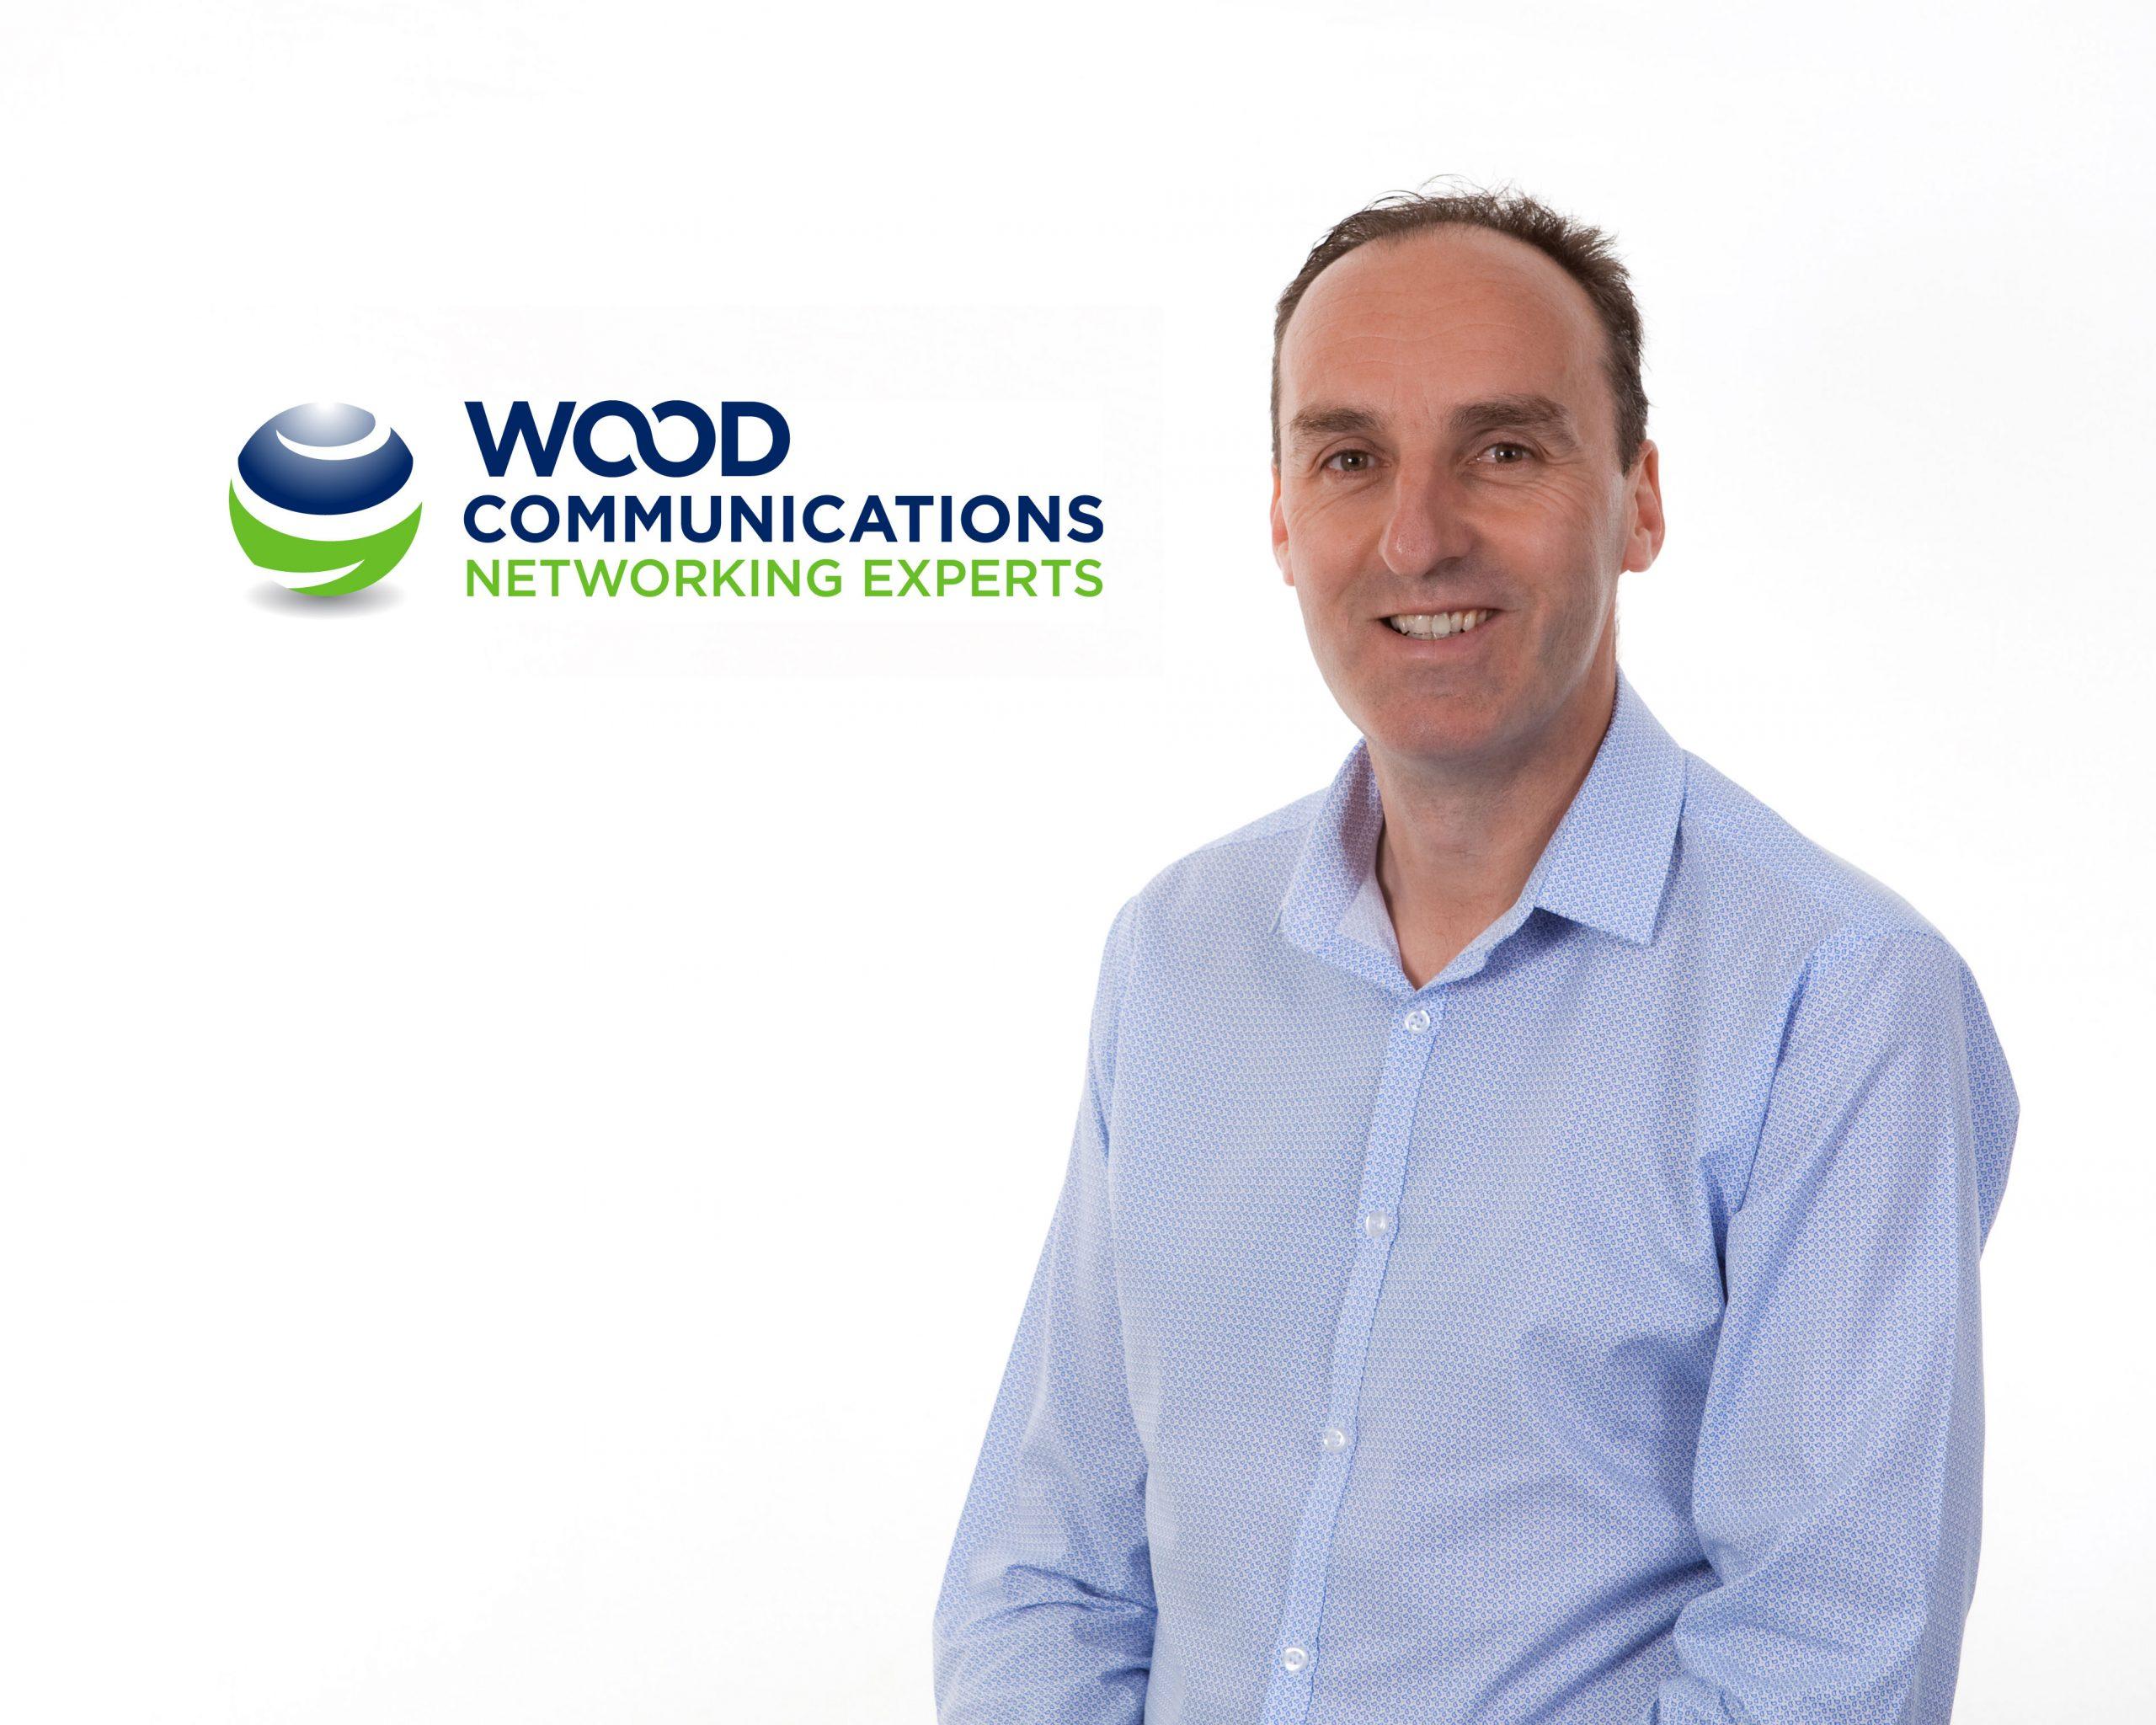 17. Derek Finlay- wood communications networking expert